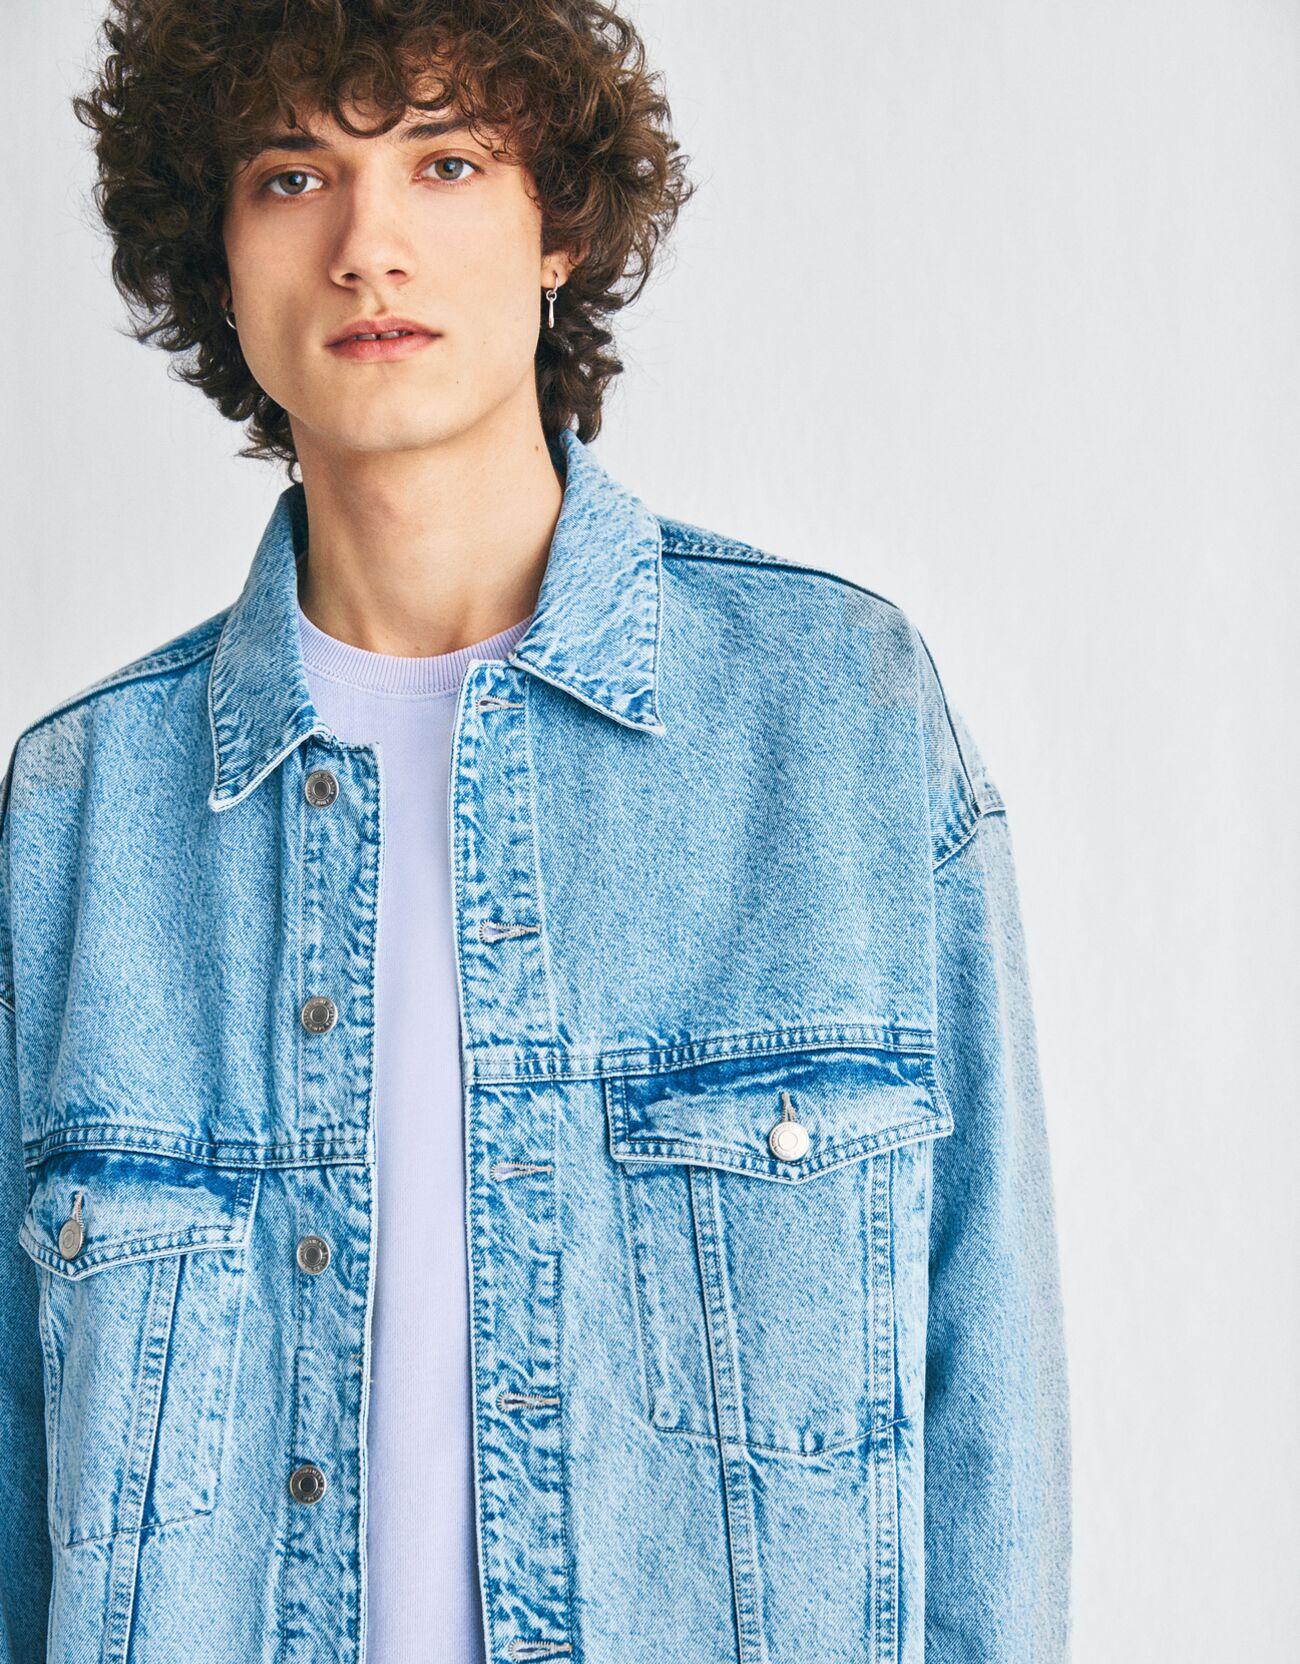 bershka -  Jeansjacke Im Boxy Fit Herren L Ausgewaschenes Blau